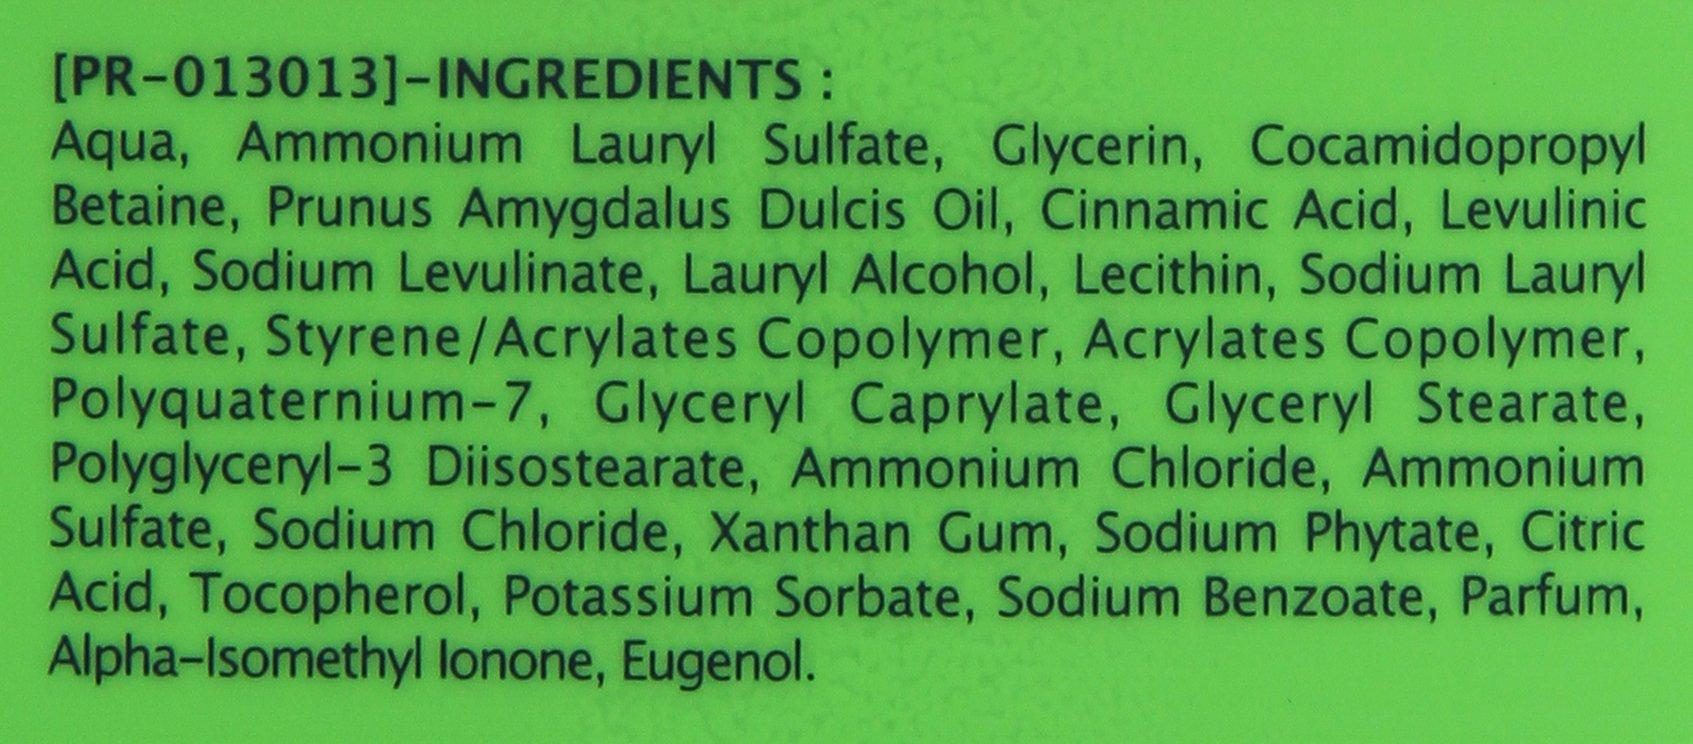 Le Petit Marseillais Gel de Leche Corporal de Almendras Dulces para la Ducha, Producto con pH Neutro para la Piel – 400 ml